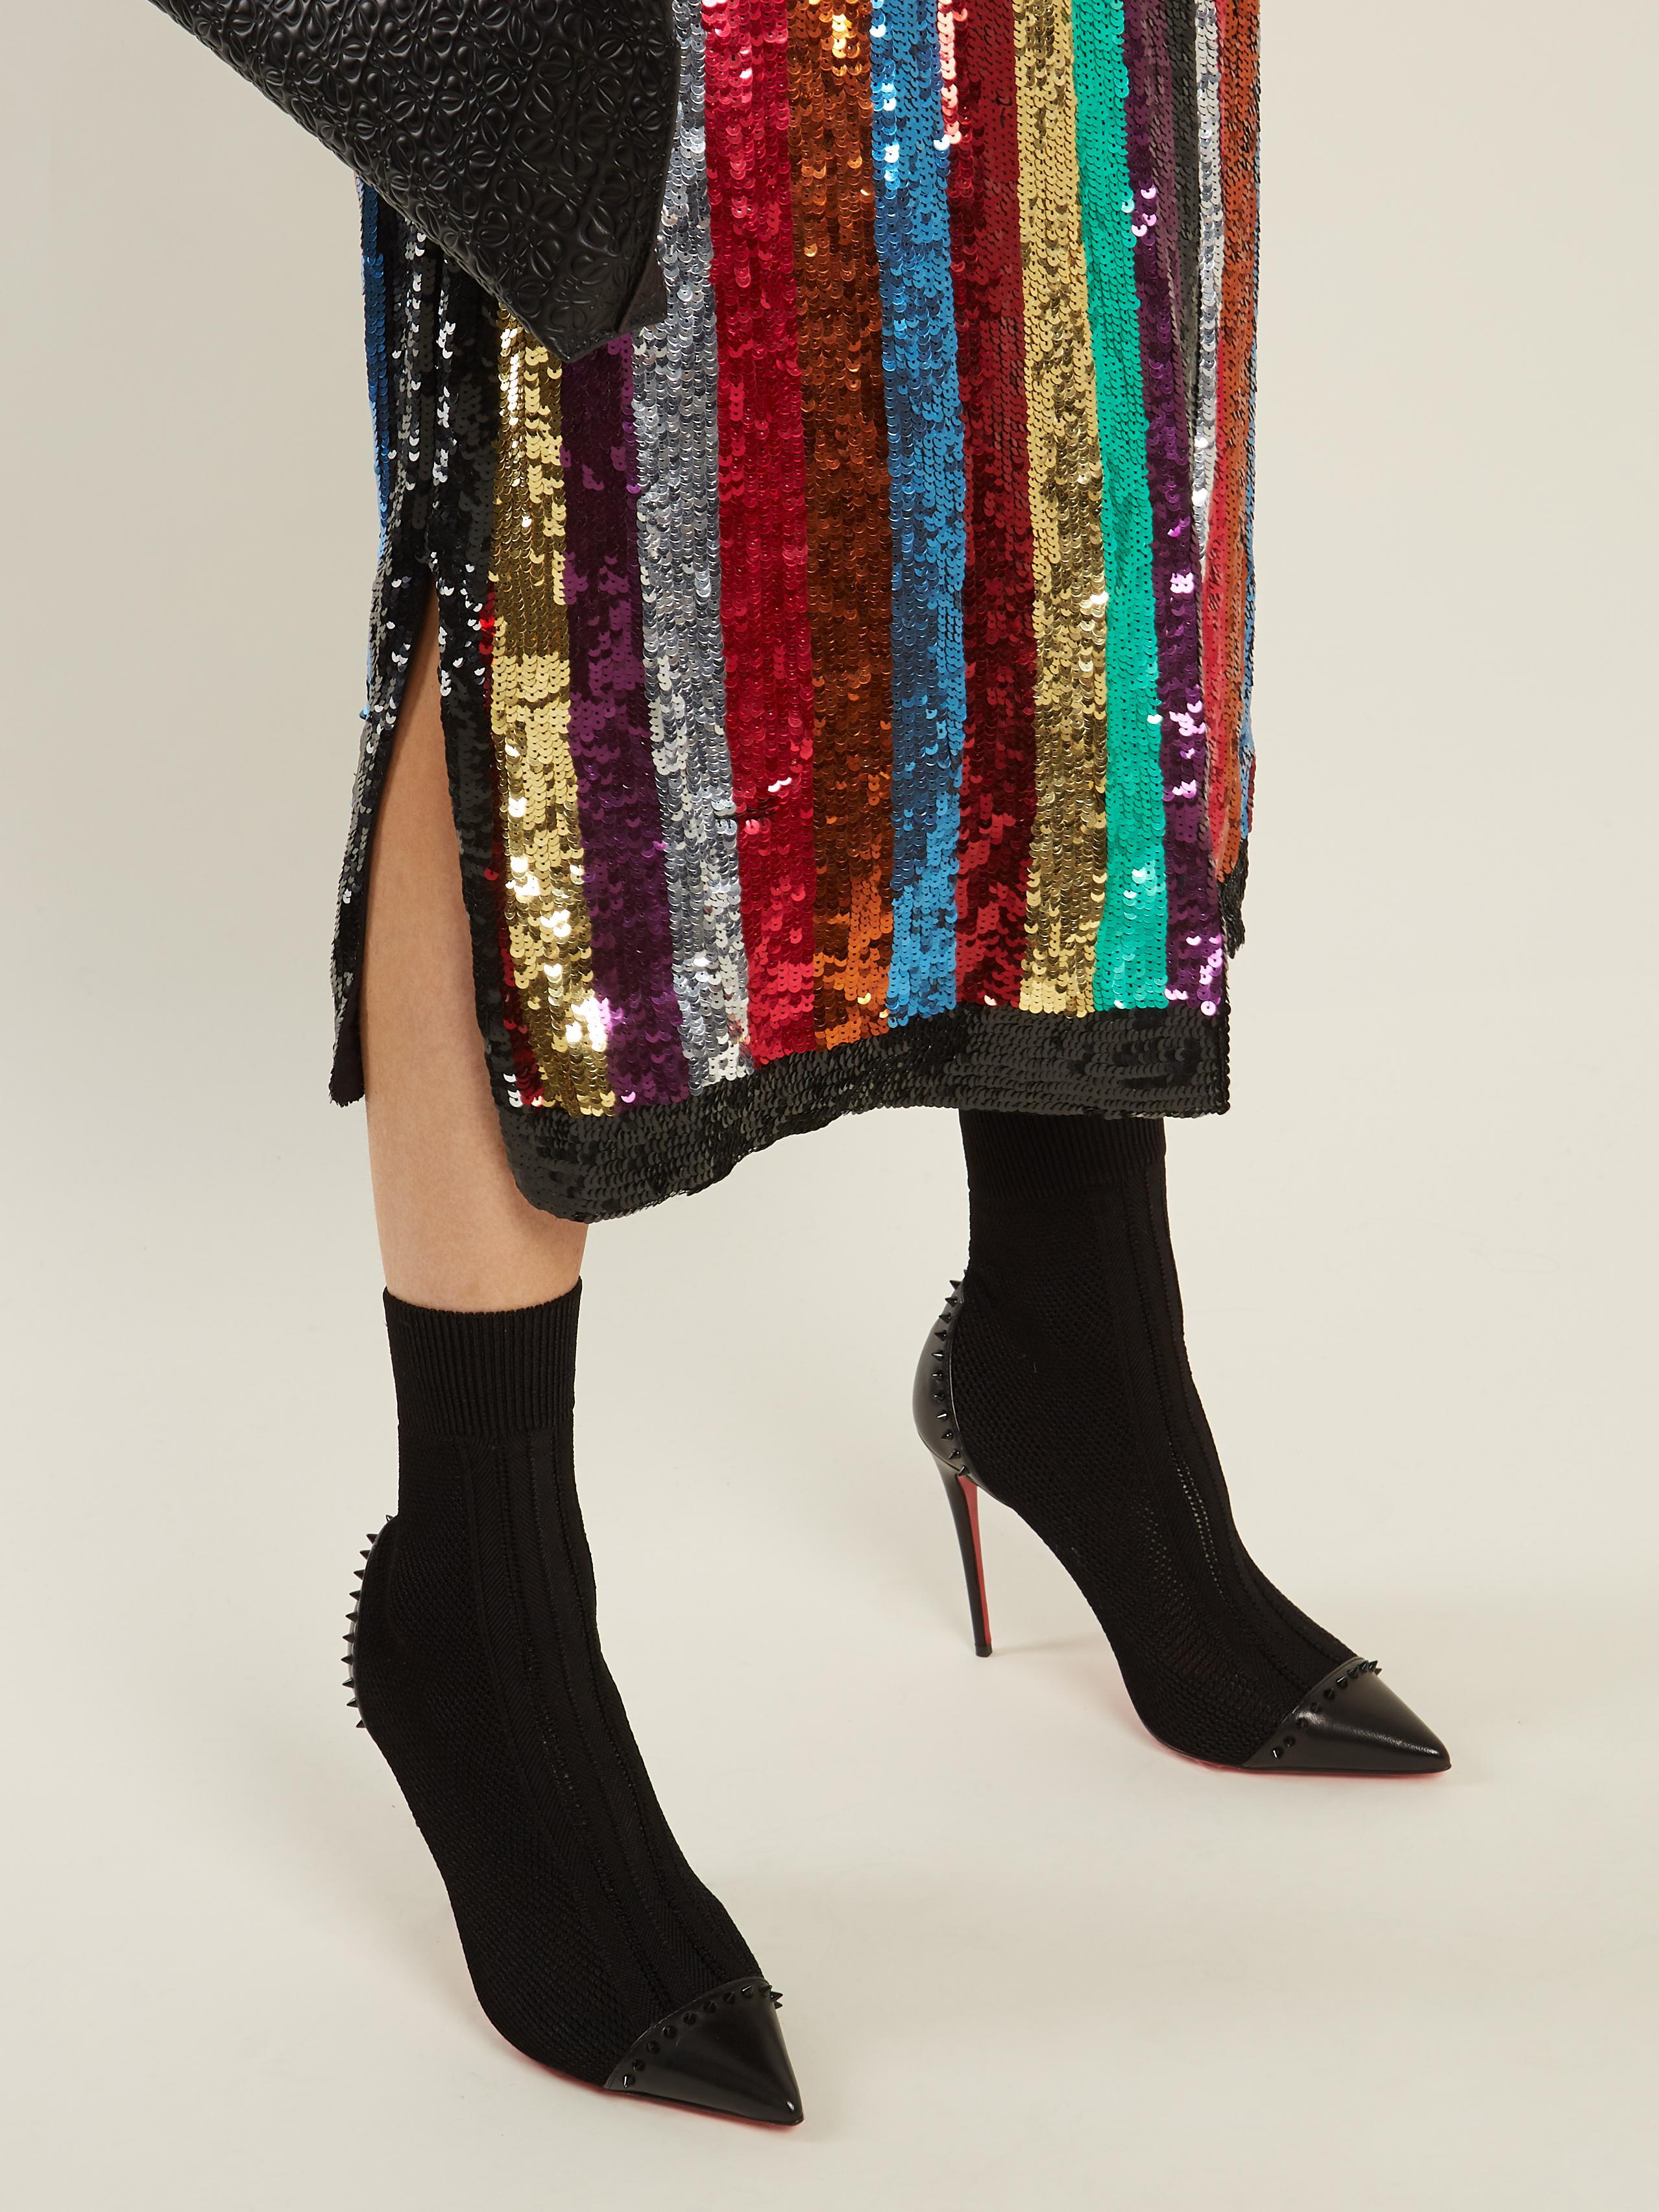 premium selection b090f 21ba3 Christian Louboutin Dovi Dova Stud-embellished Sock Boots in ...